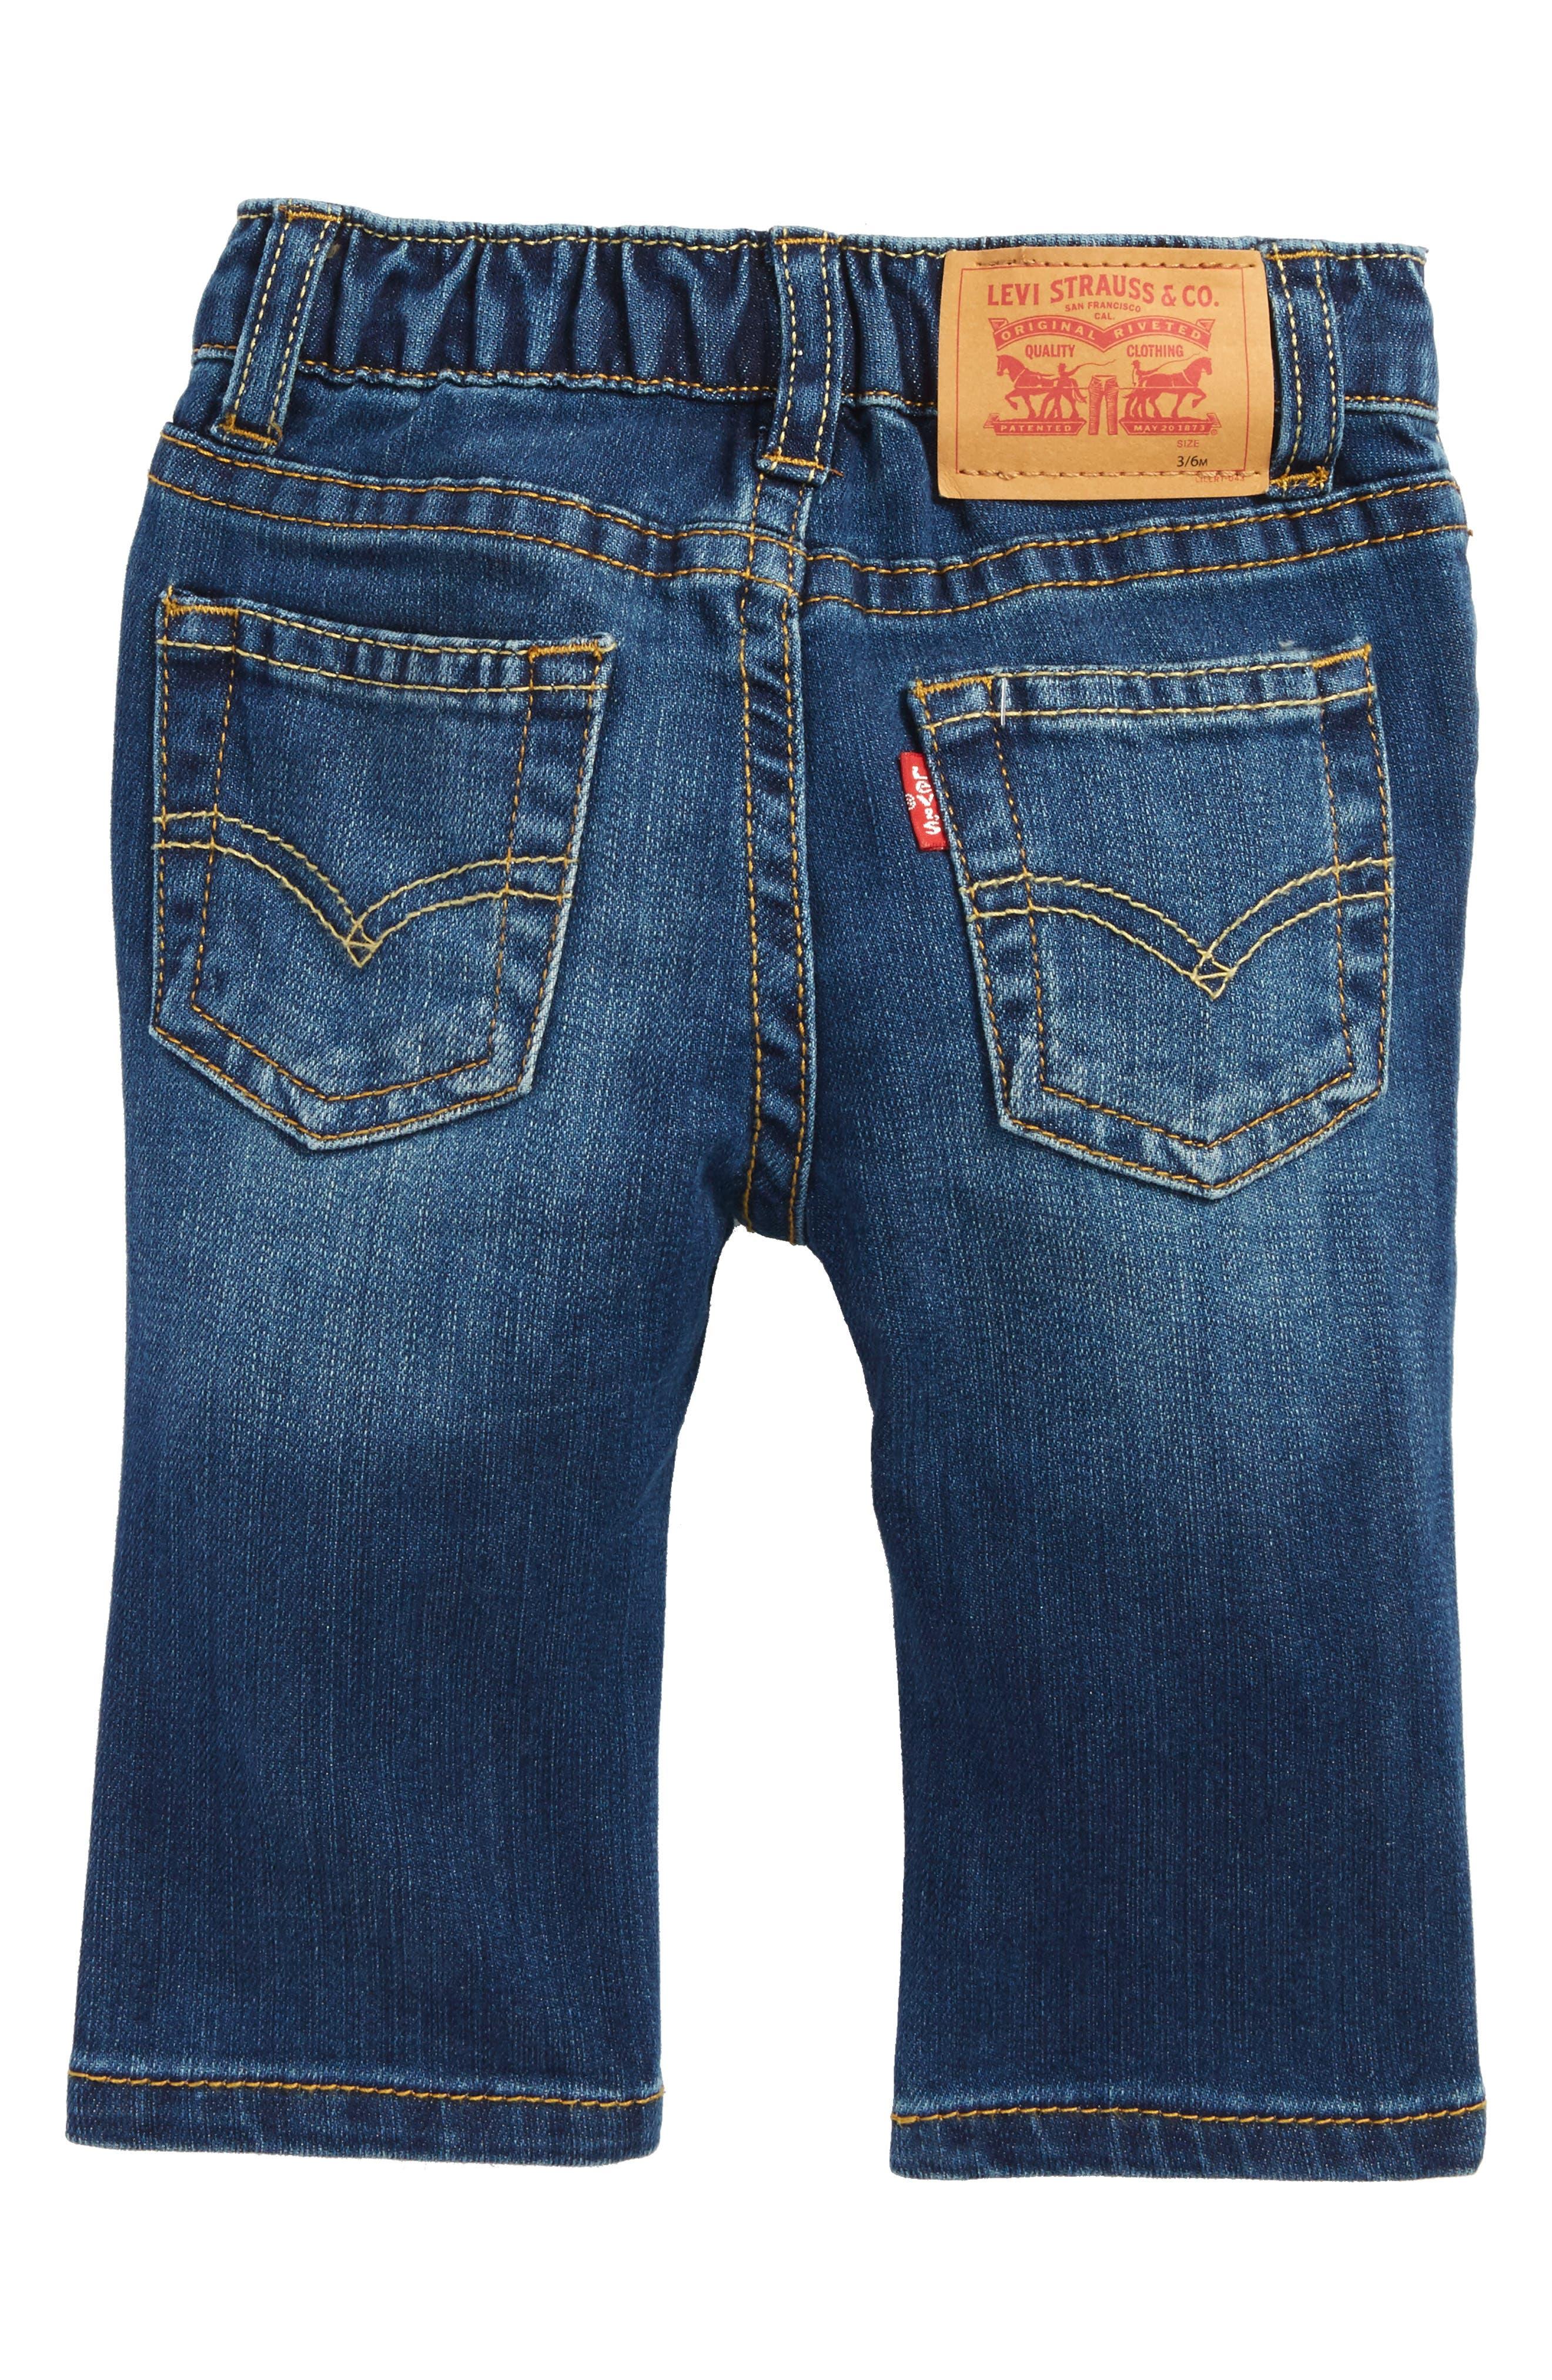 Alternate Image 2  - Levi's® Comfort Slim Fit Jeans (Reflex Blue) (Baby Boys)